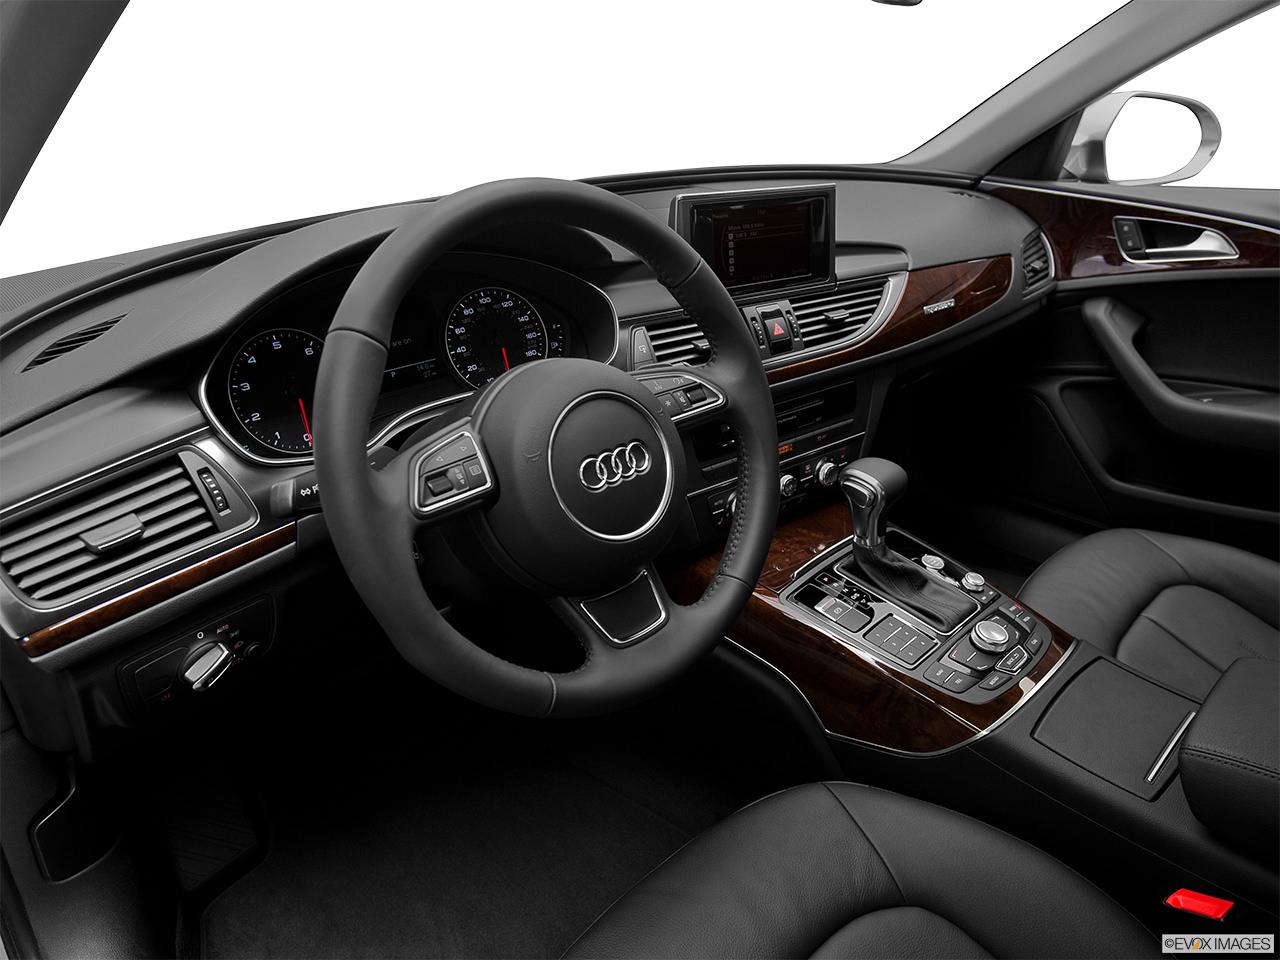 Audi A6 2012 Interior